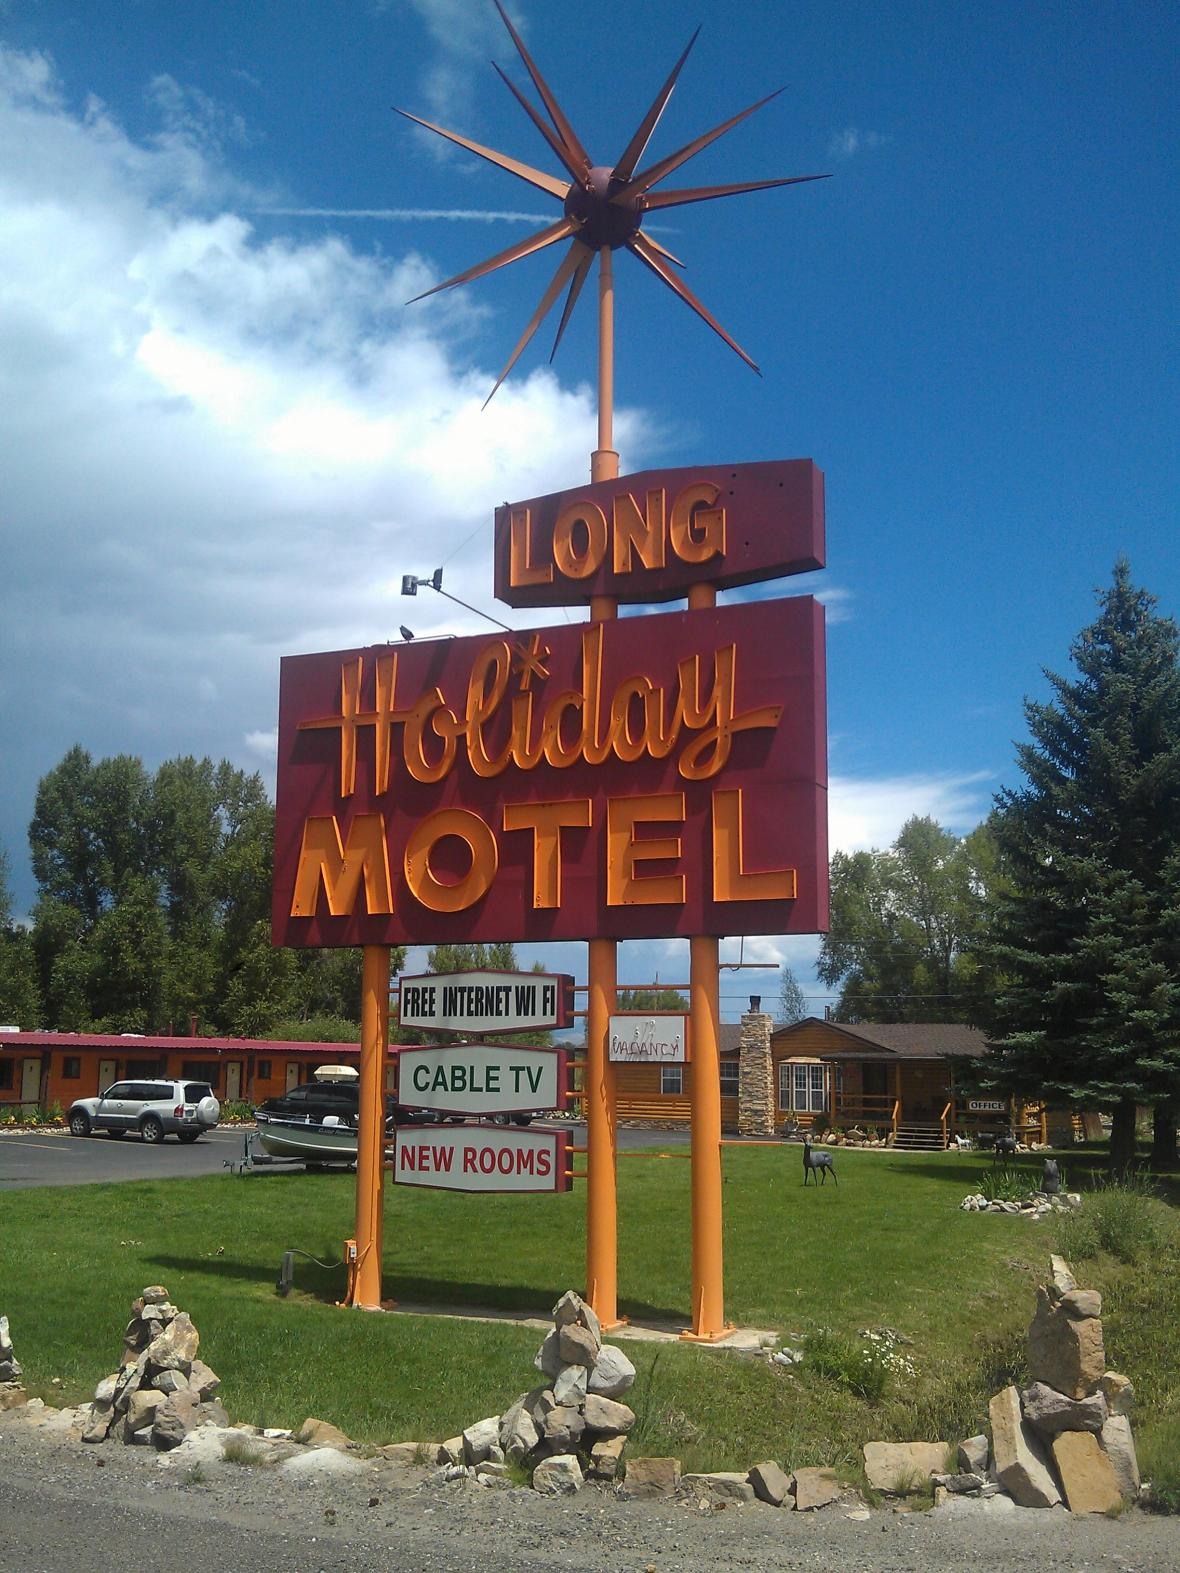 Long Holiday Motel - 1198 West U.S. Highway 50, Gunnison, Colorado U.S.A. - August 3, 2013